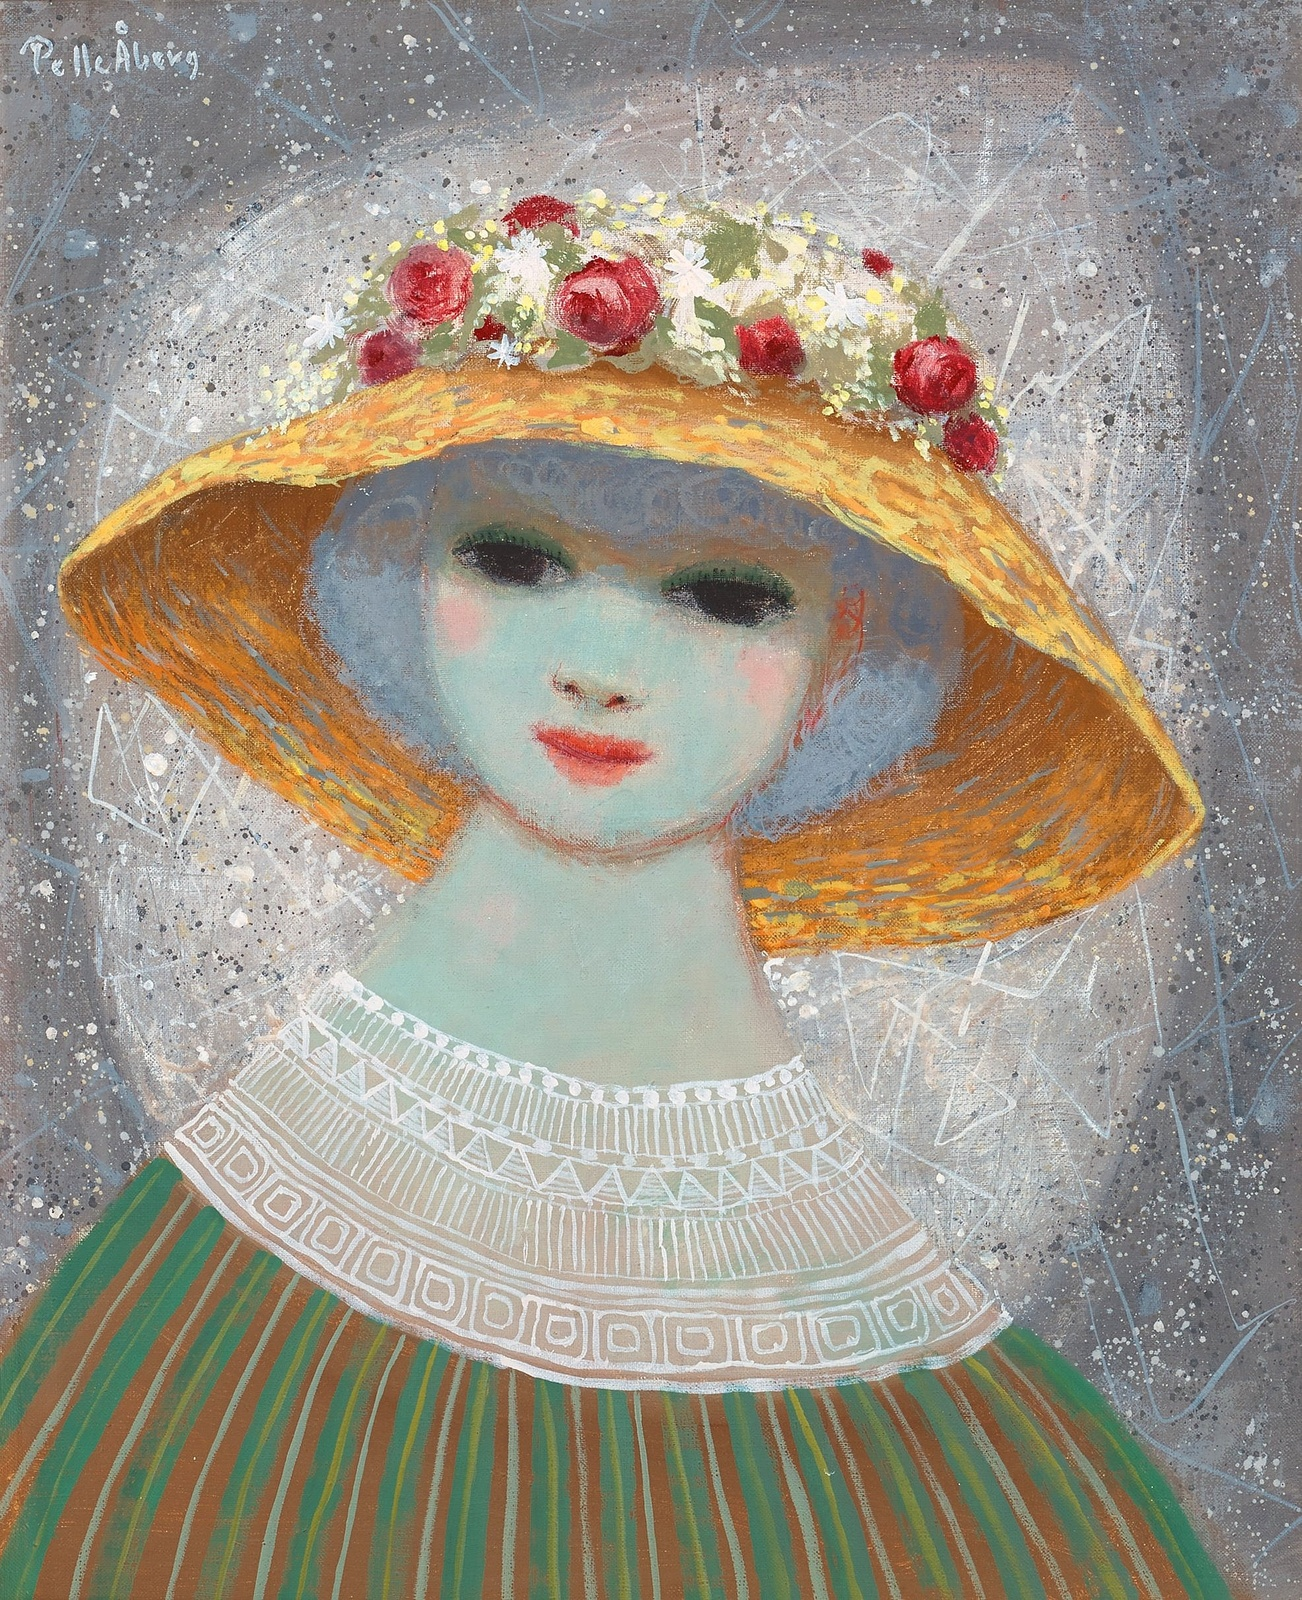 Девушка в шляпе (Girl in hat)_61 х 50_х.,м._Частное собрание.jpg